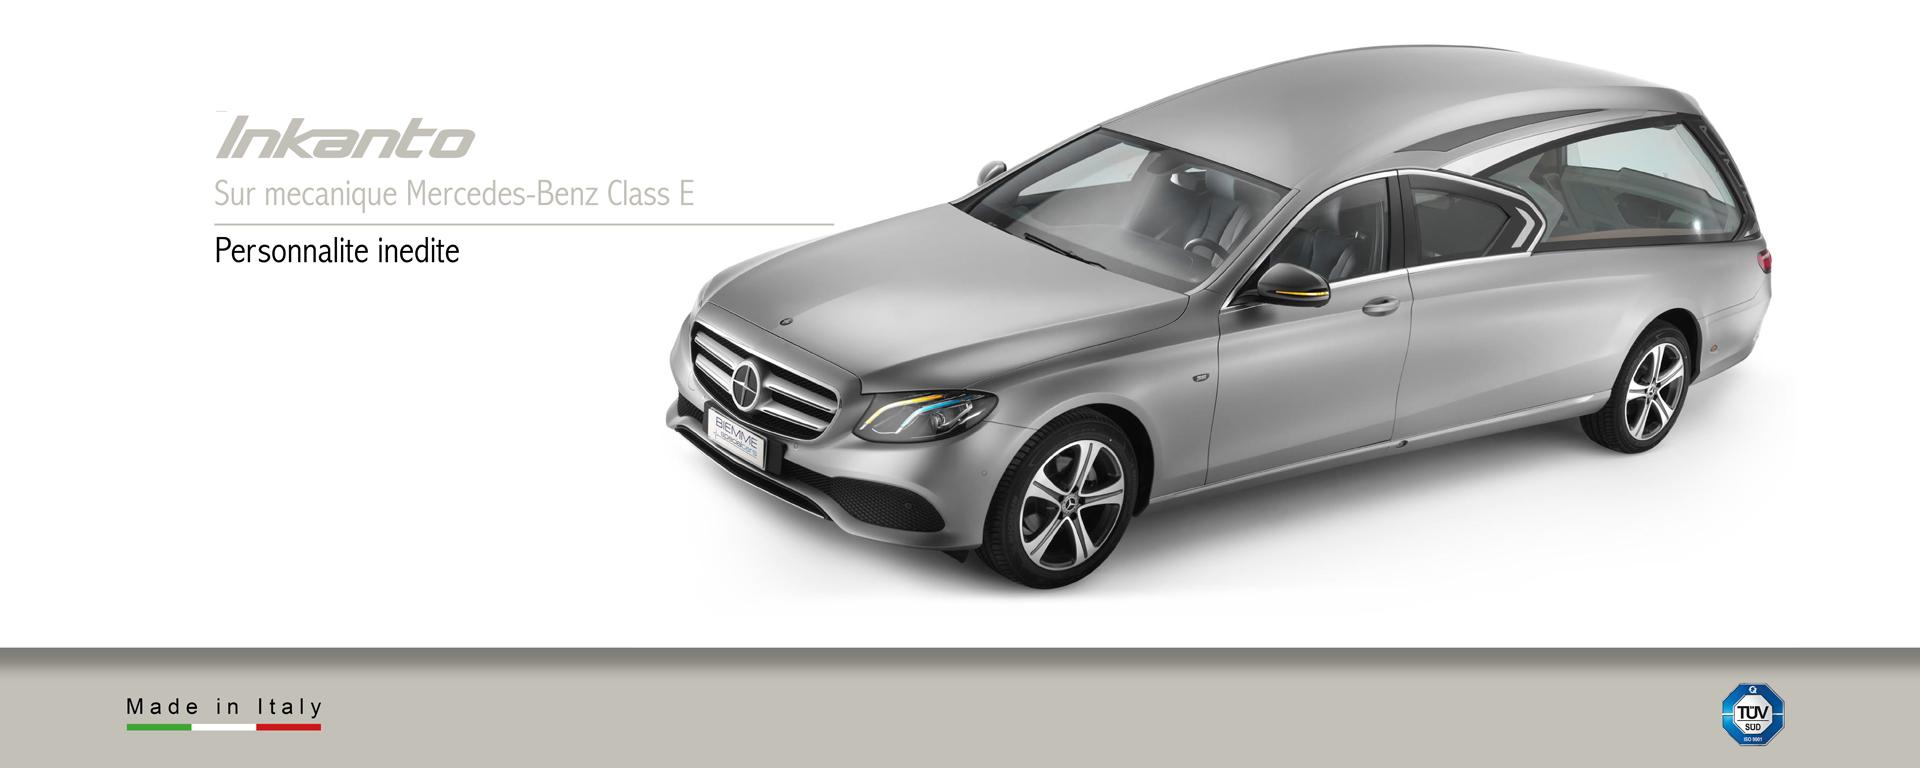 Corbillard mecanique Mercedes-Benz E Class